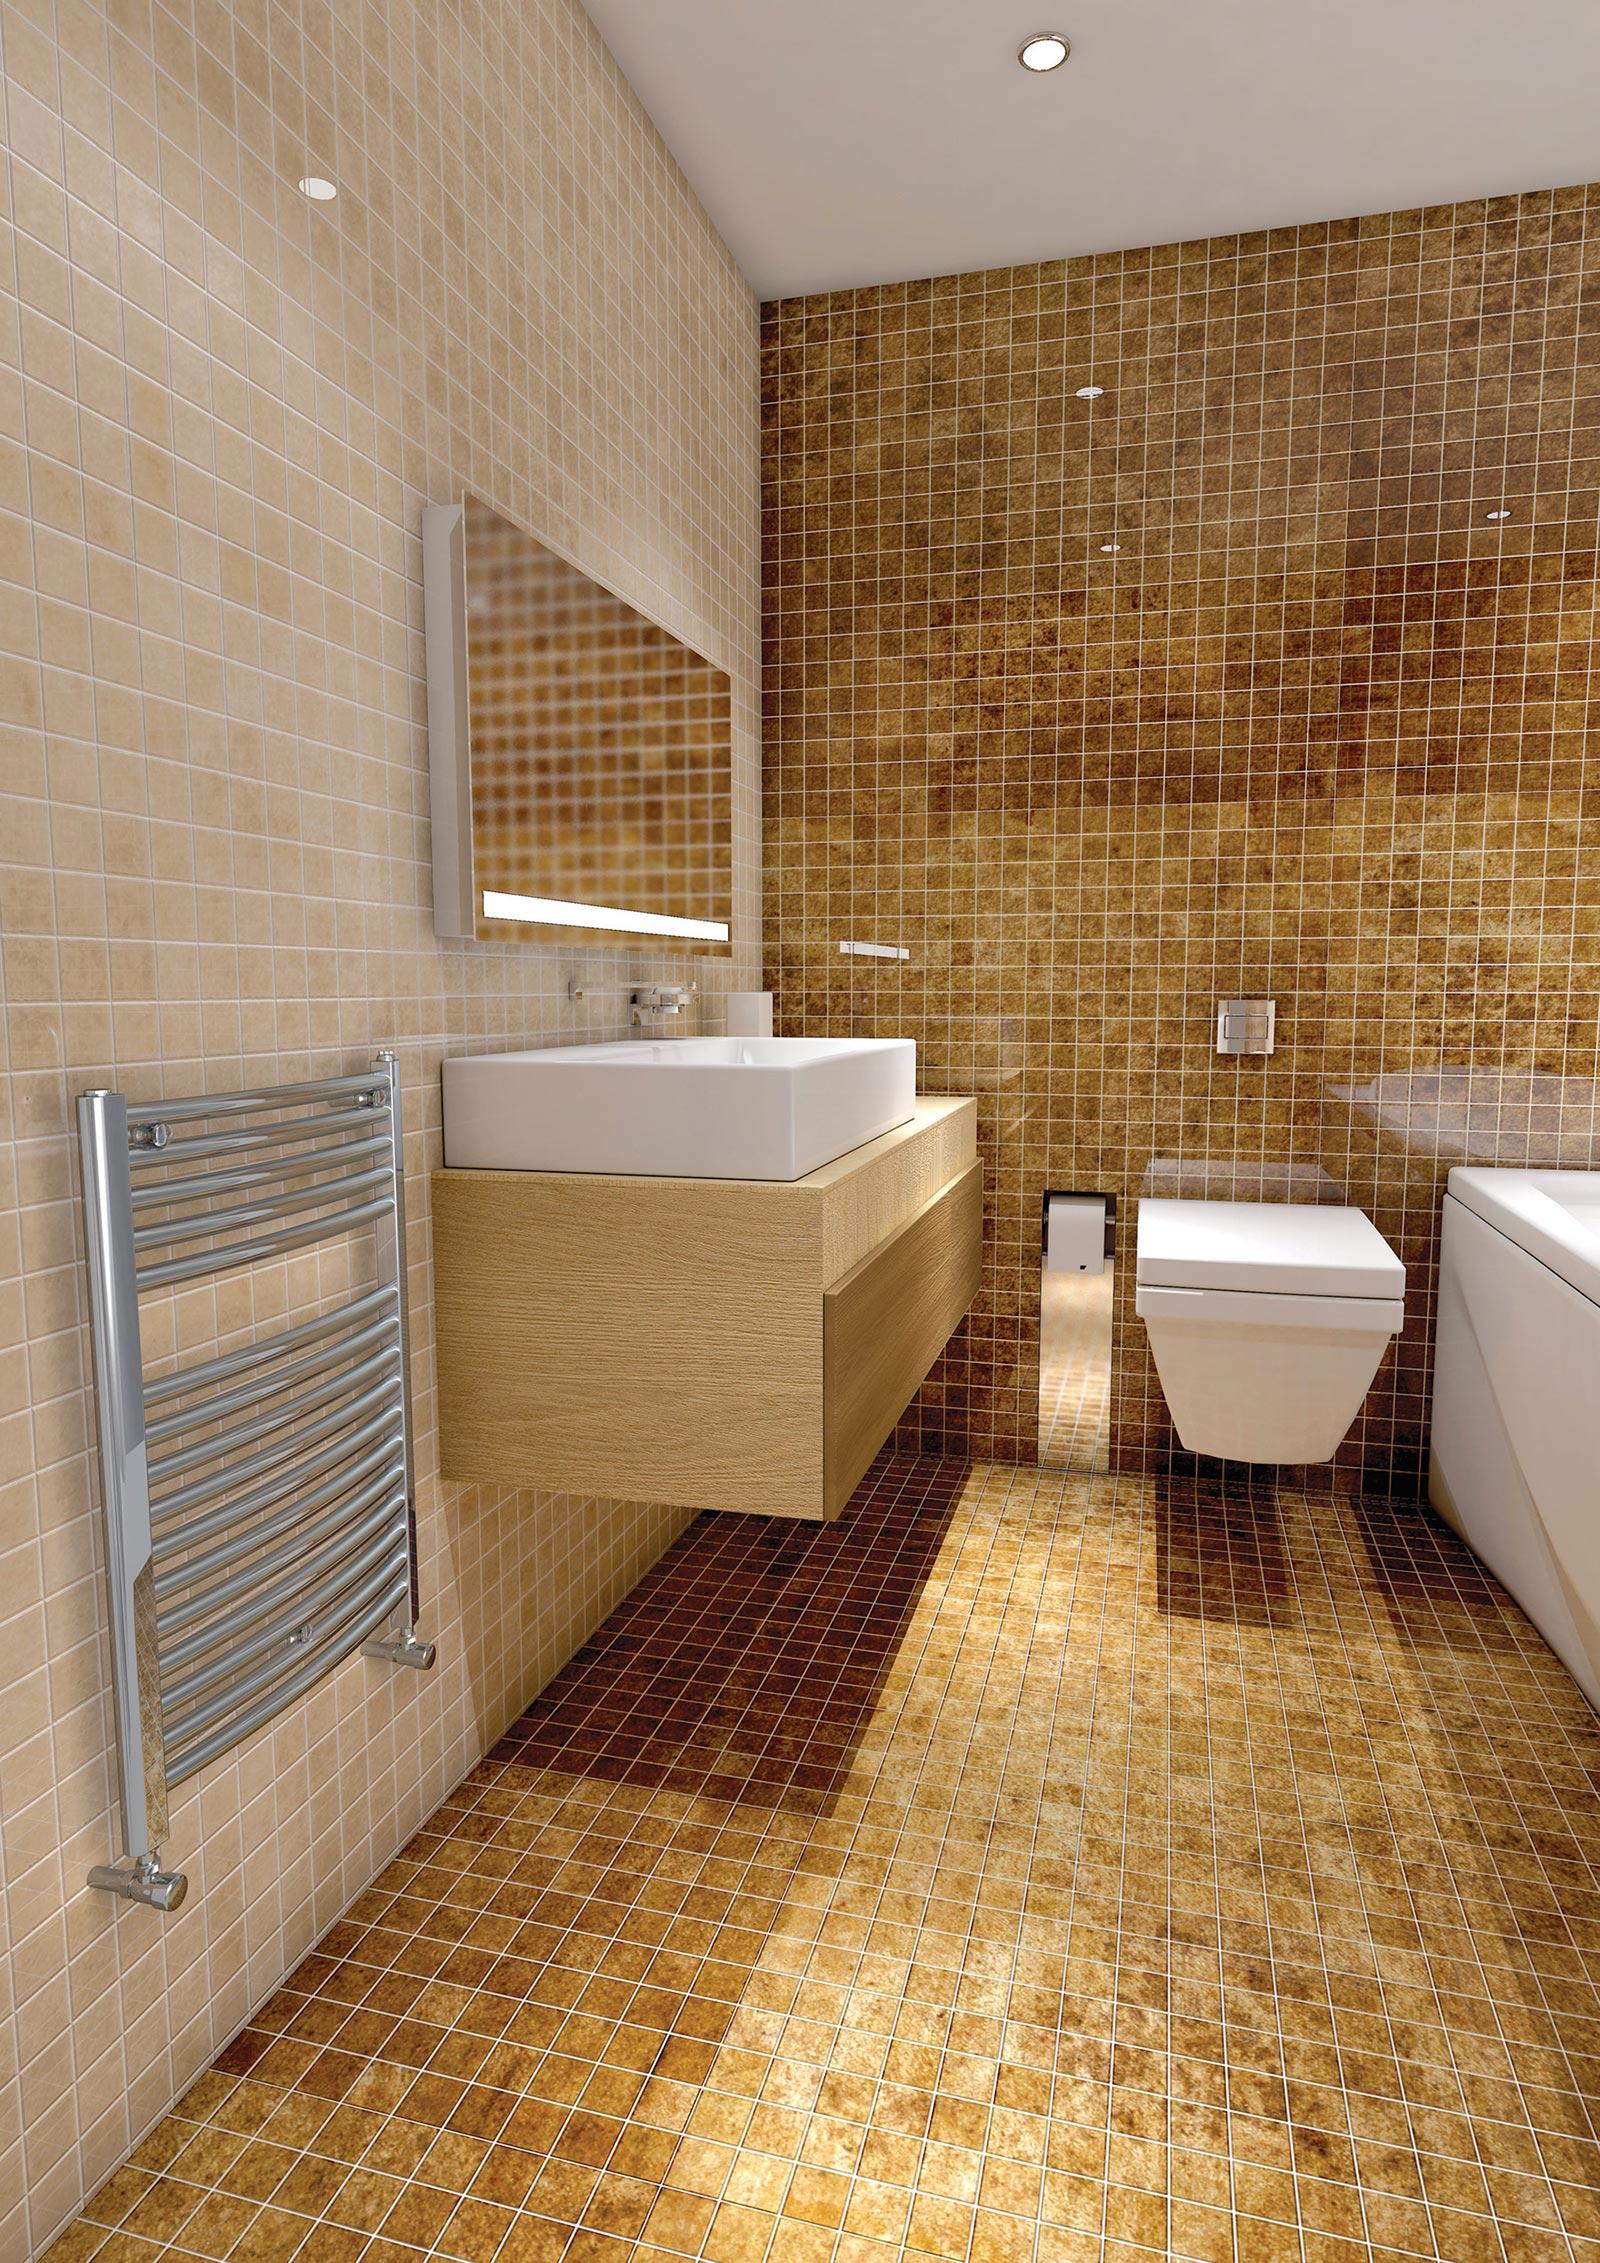 Towel Rail | Heated Towel Rail | Stelrad